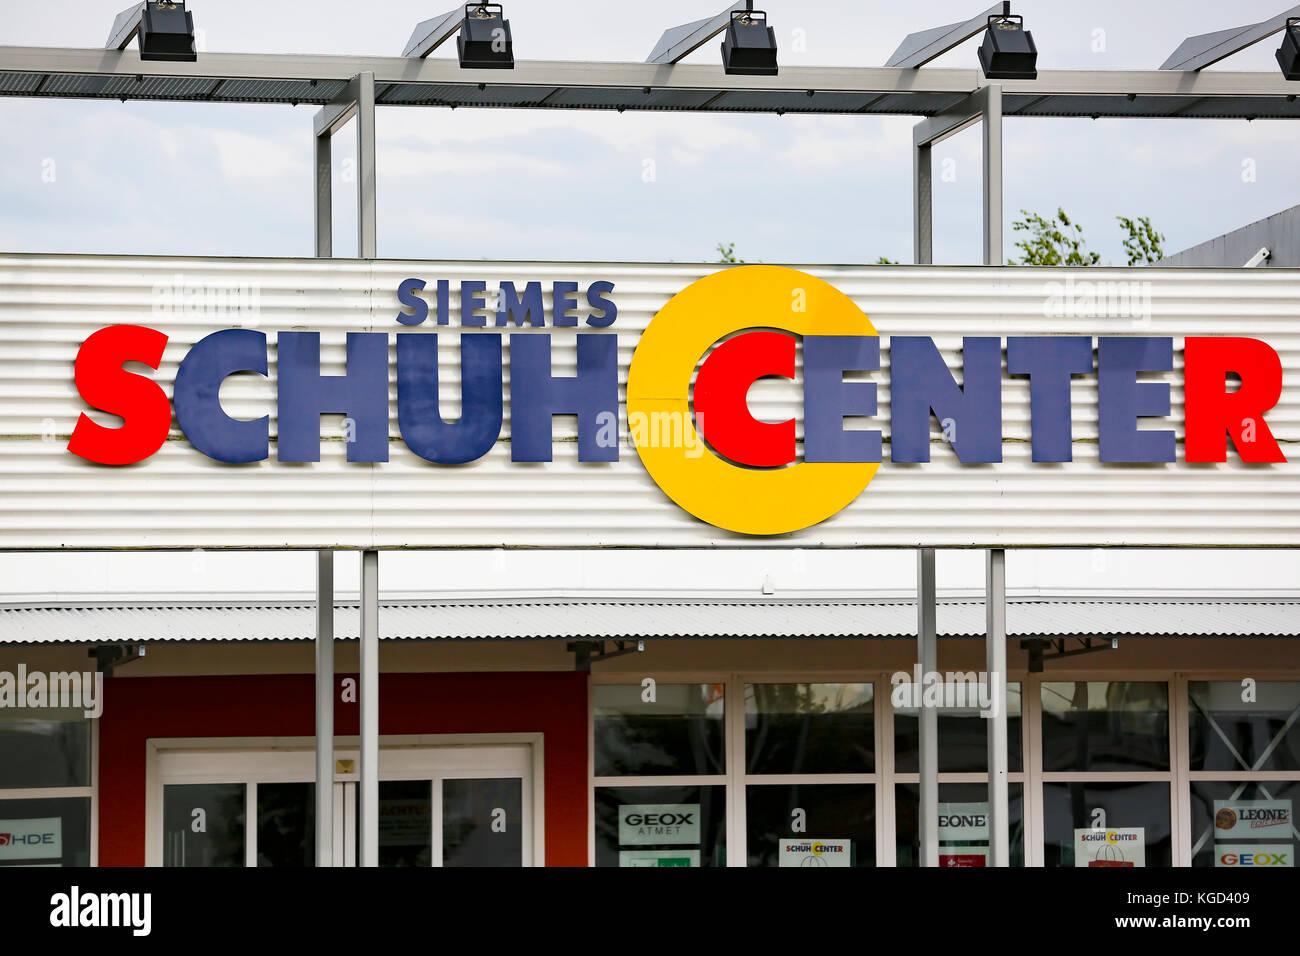 LINDEN, GERMANY JULY 2017: Siemes Schuhcenter ( shoe center ) store. Siemes Schuhcenter GmbH & Co KG based in - Stock Image